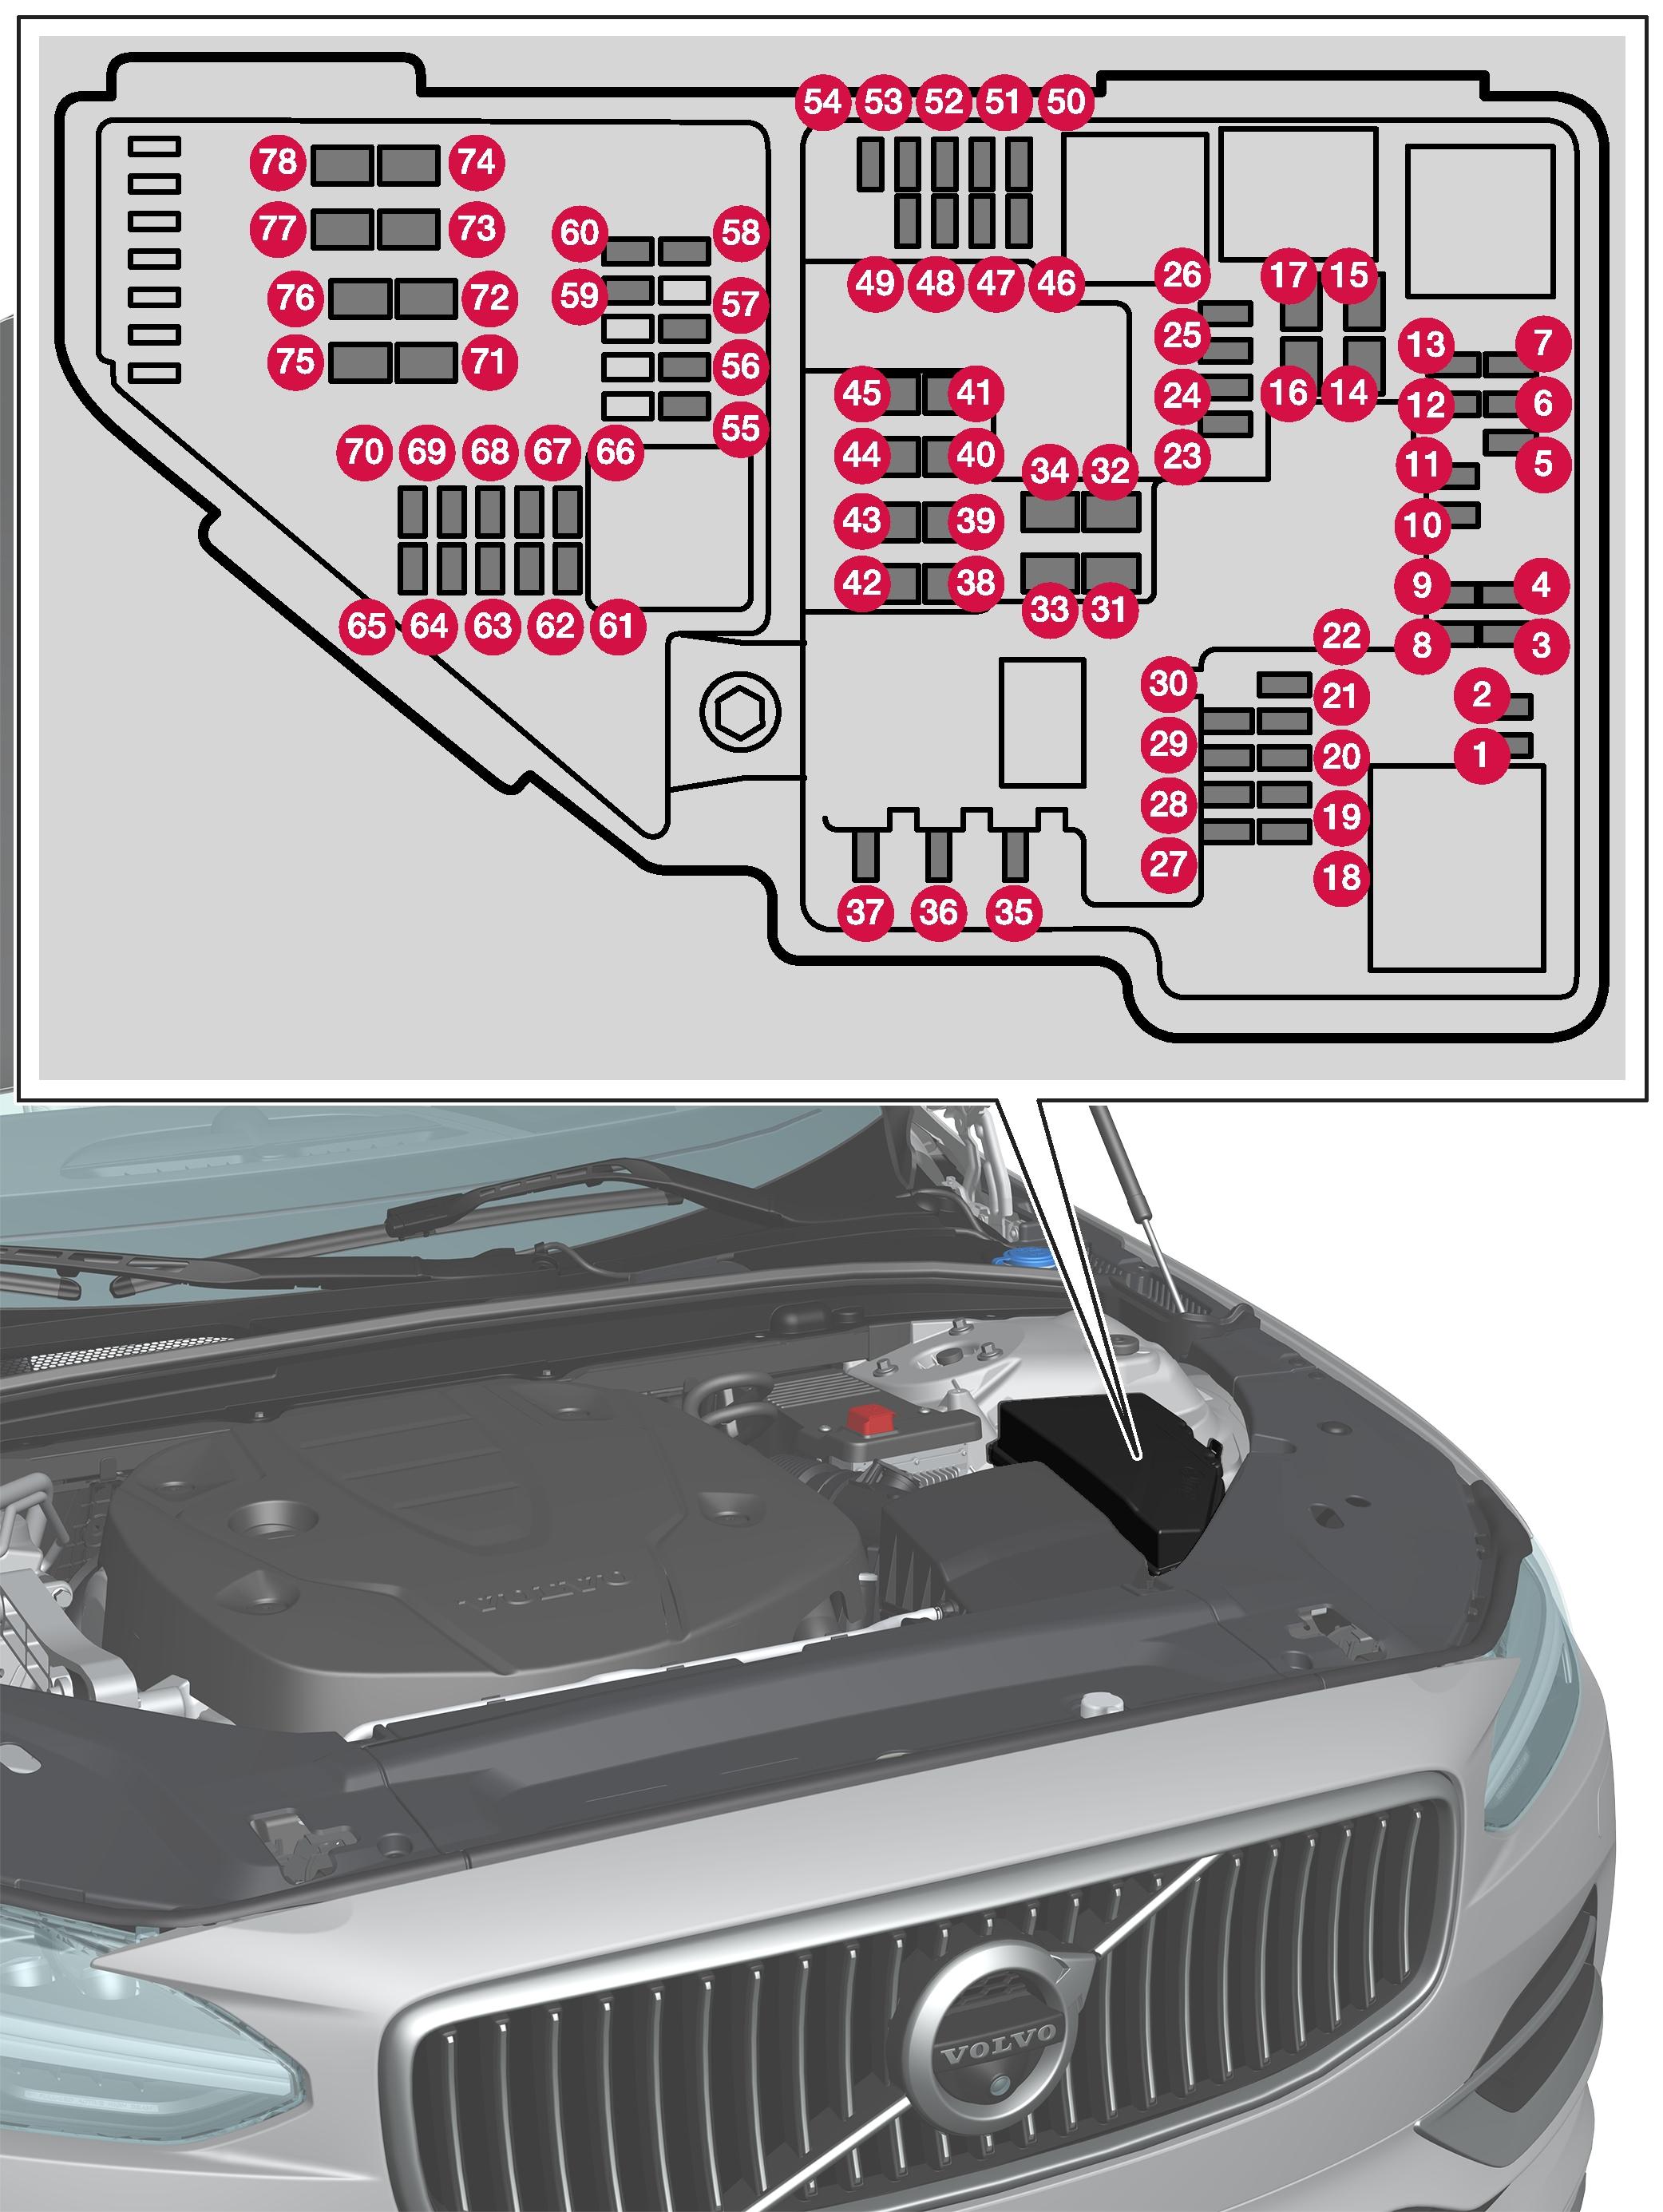 P5-1646-S90/V90 Hybrid EJB Fuses